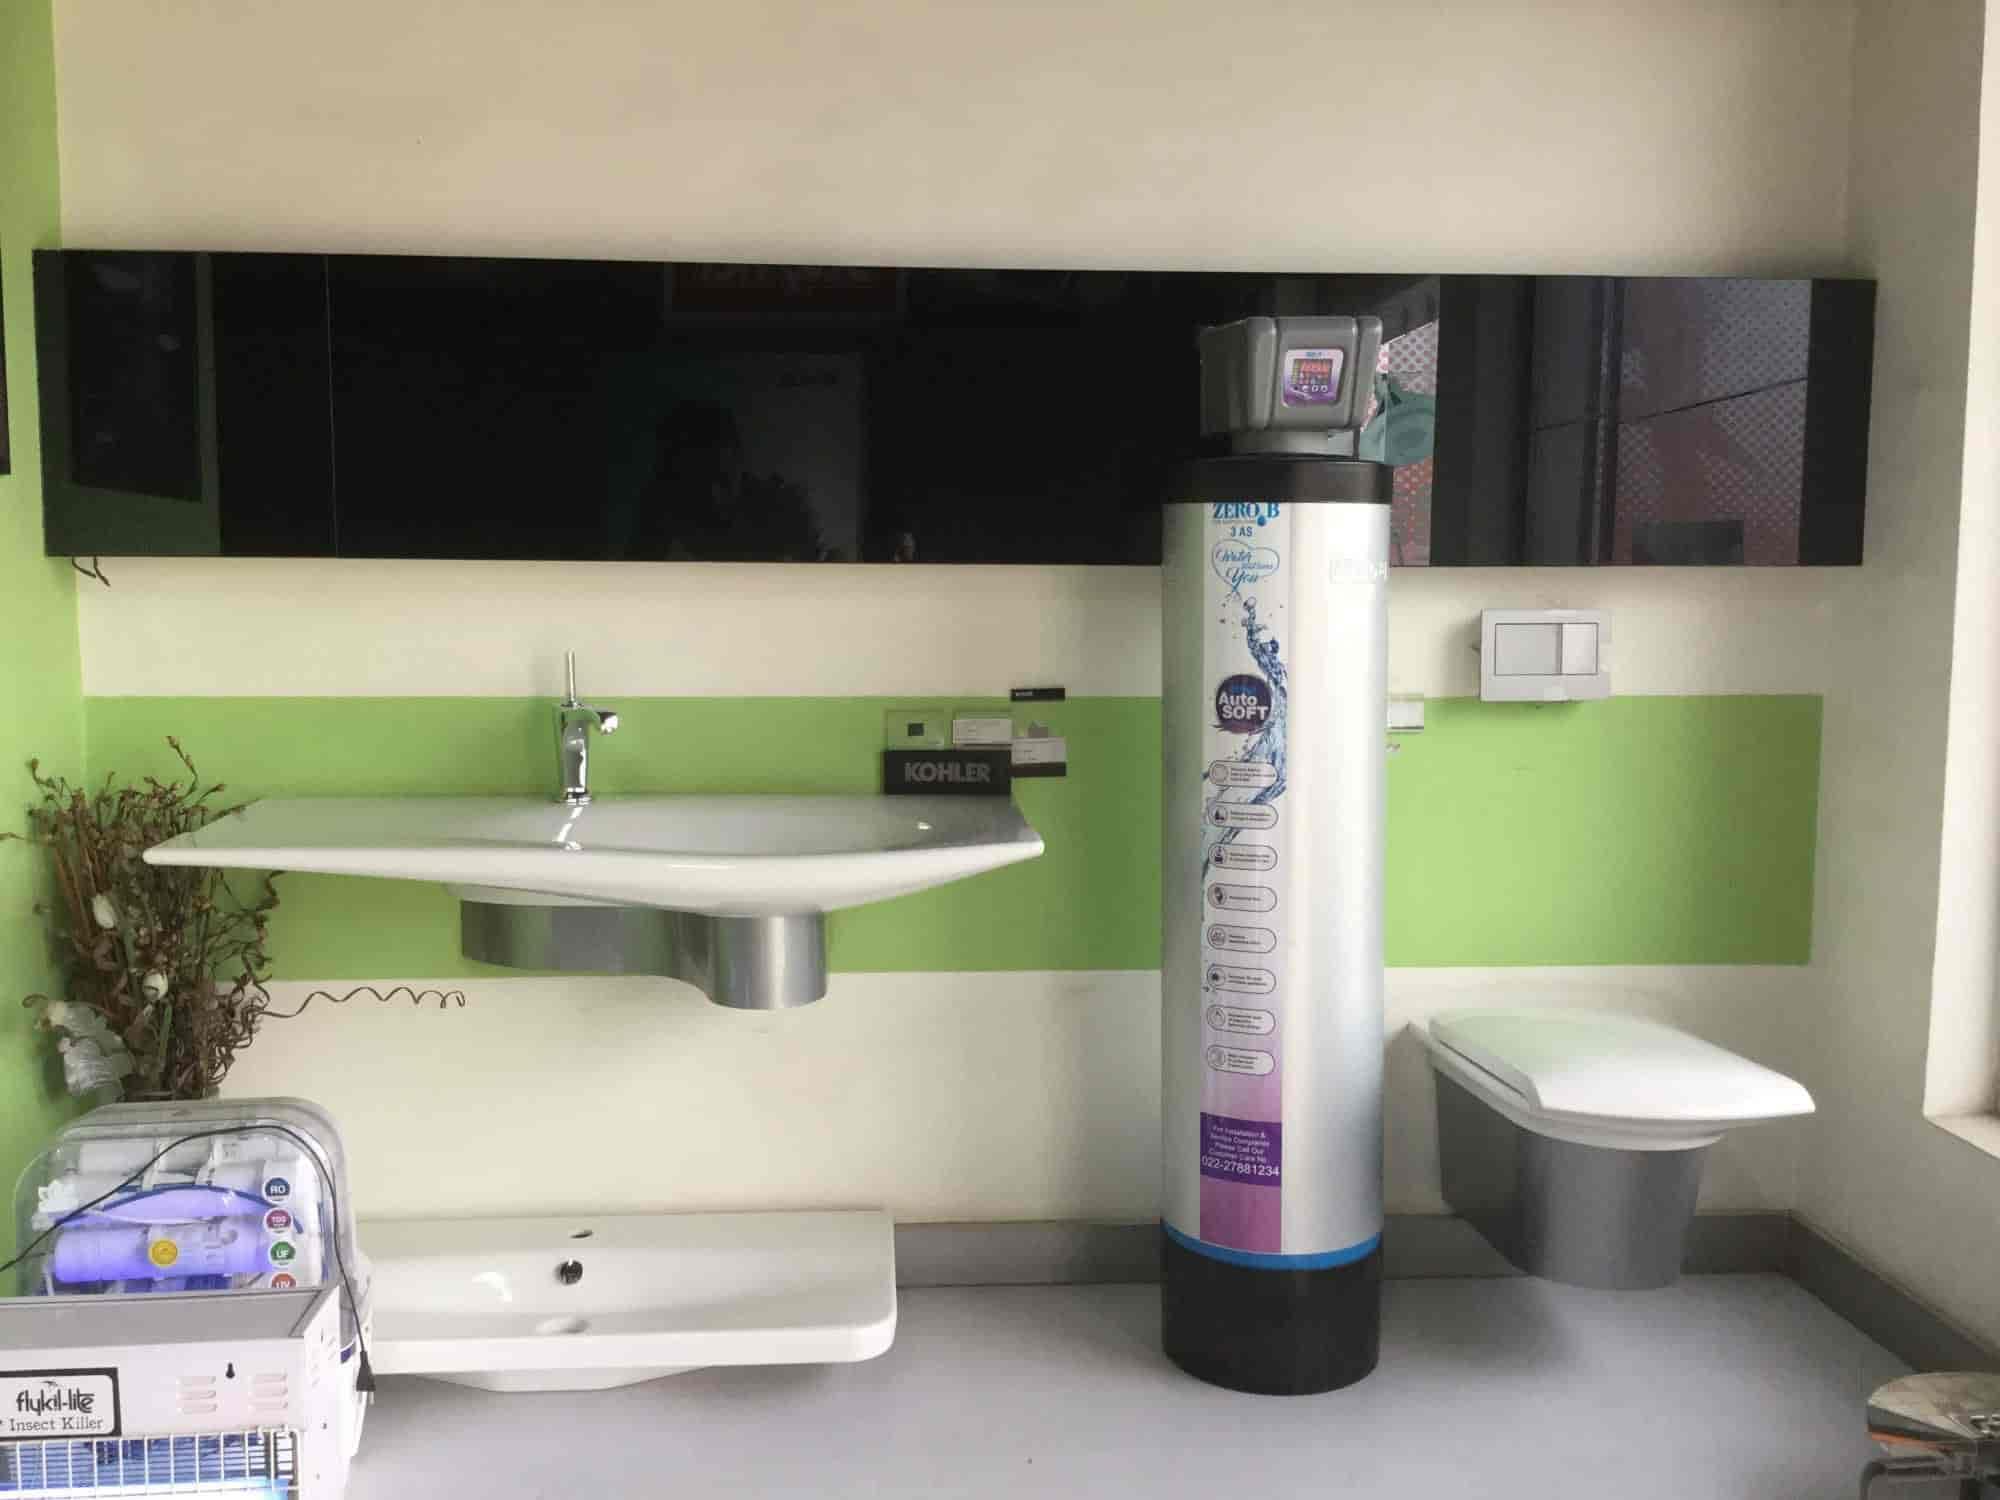 Fresh Bath, Arya Nagar - Sanitaryware Dealers in Delhi - Justdial